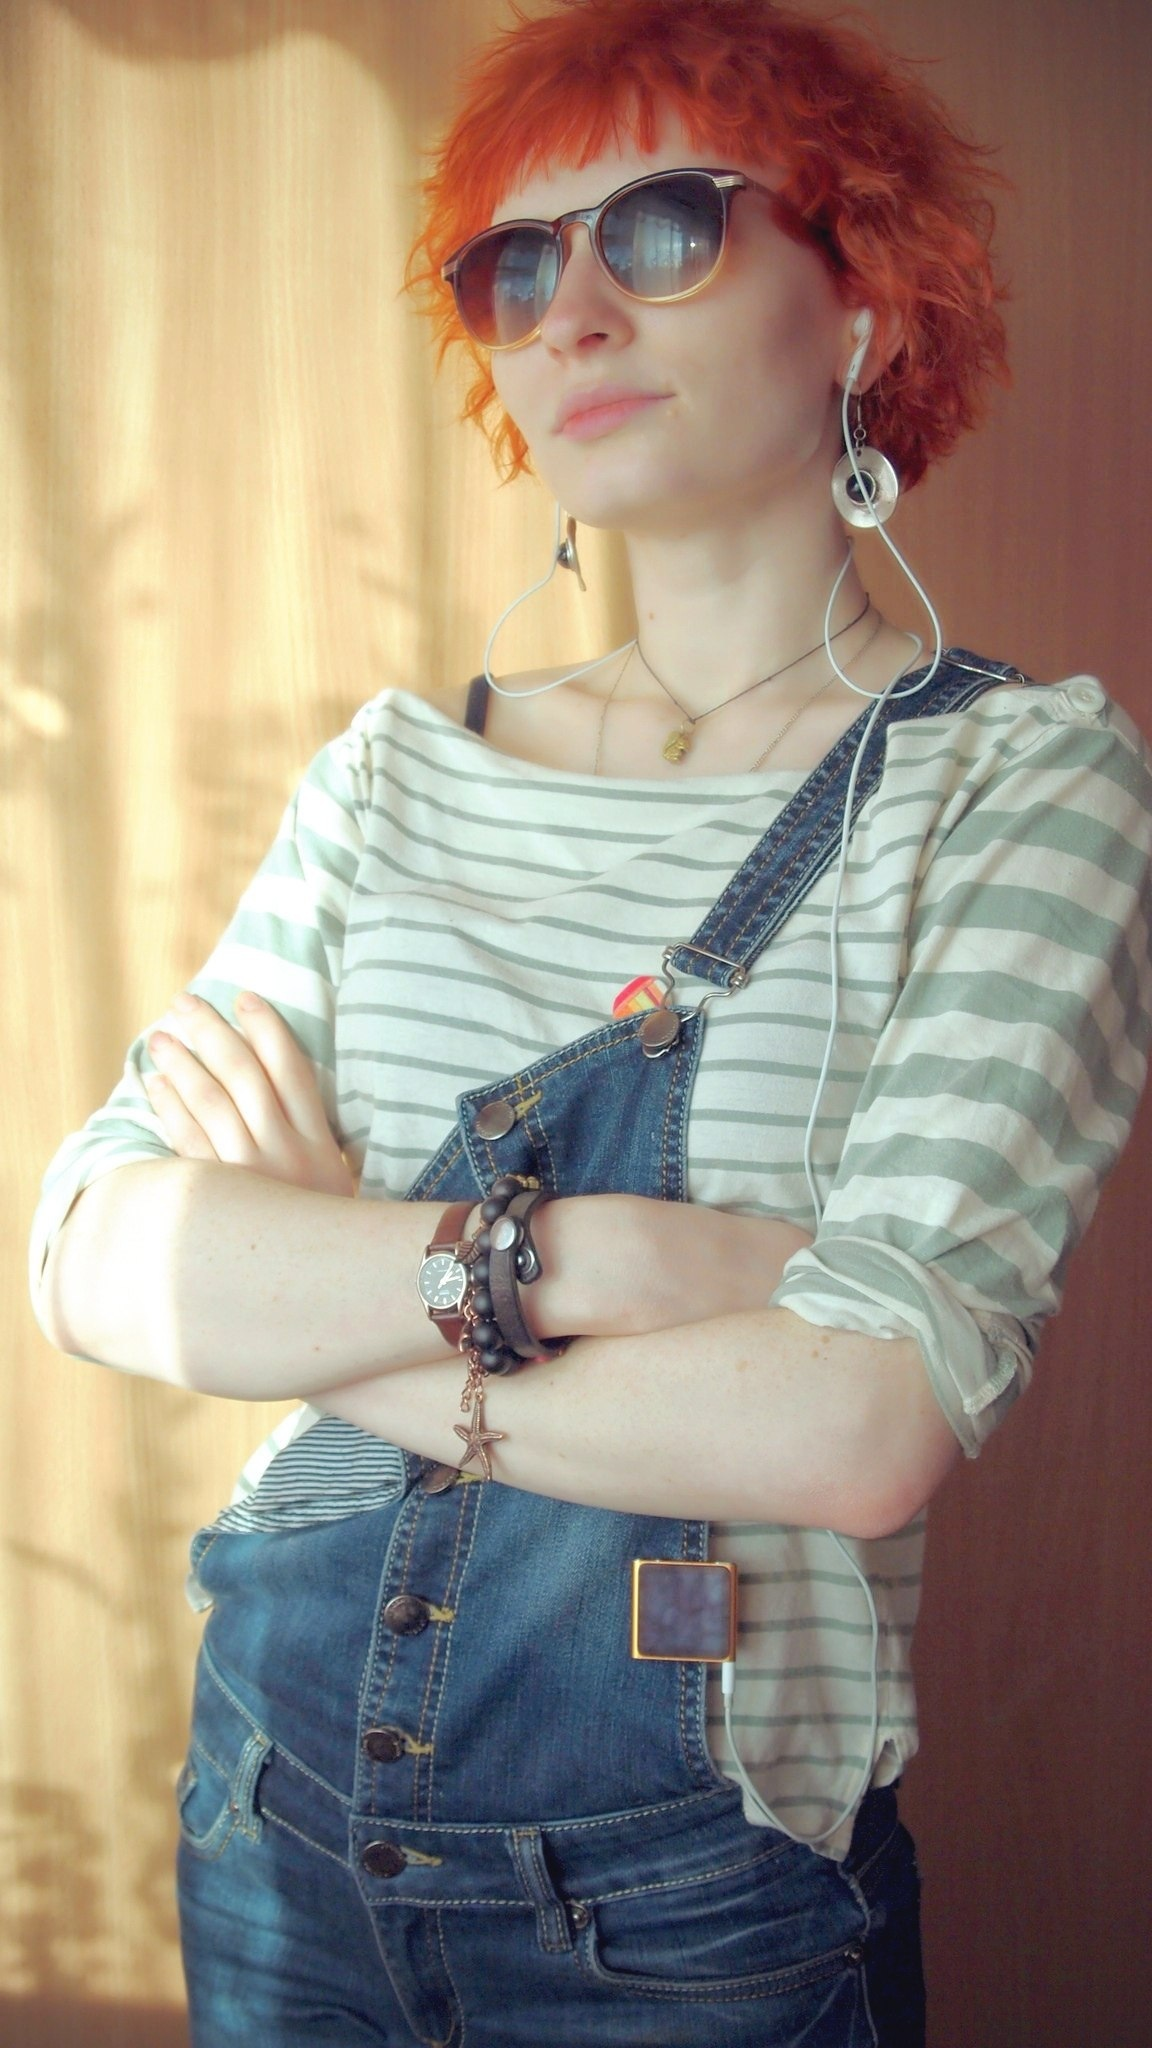 Резюме  гример – парикмахер - стилист